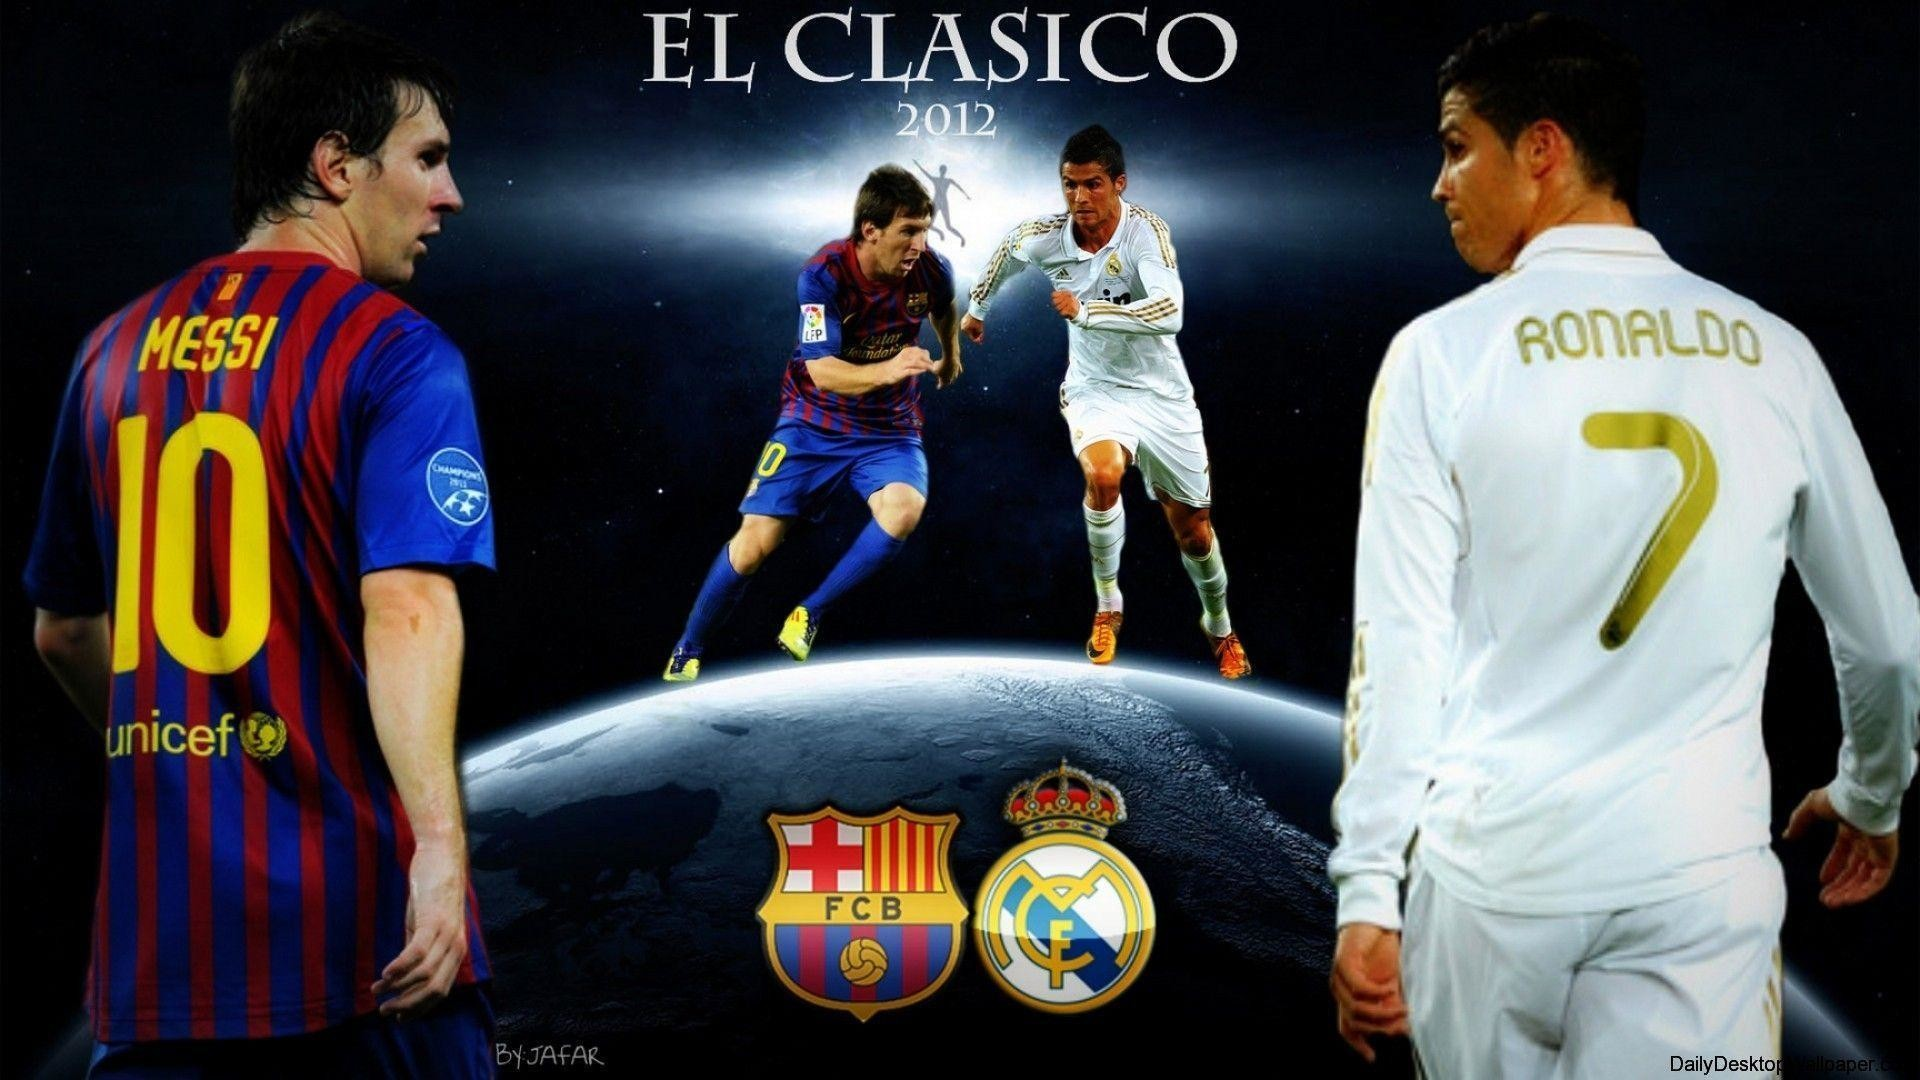 Messi-And-Ronaldo-2012 Ronaldo wallpaper HD free wallpapers .